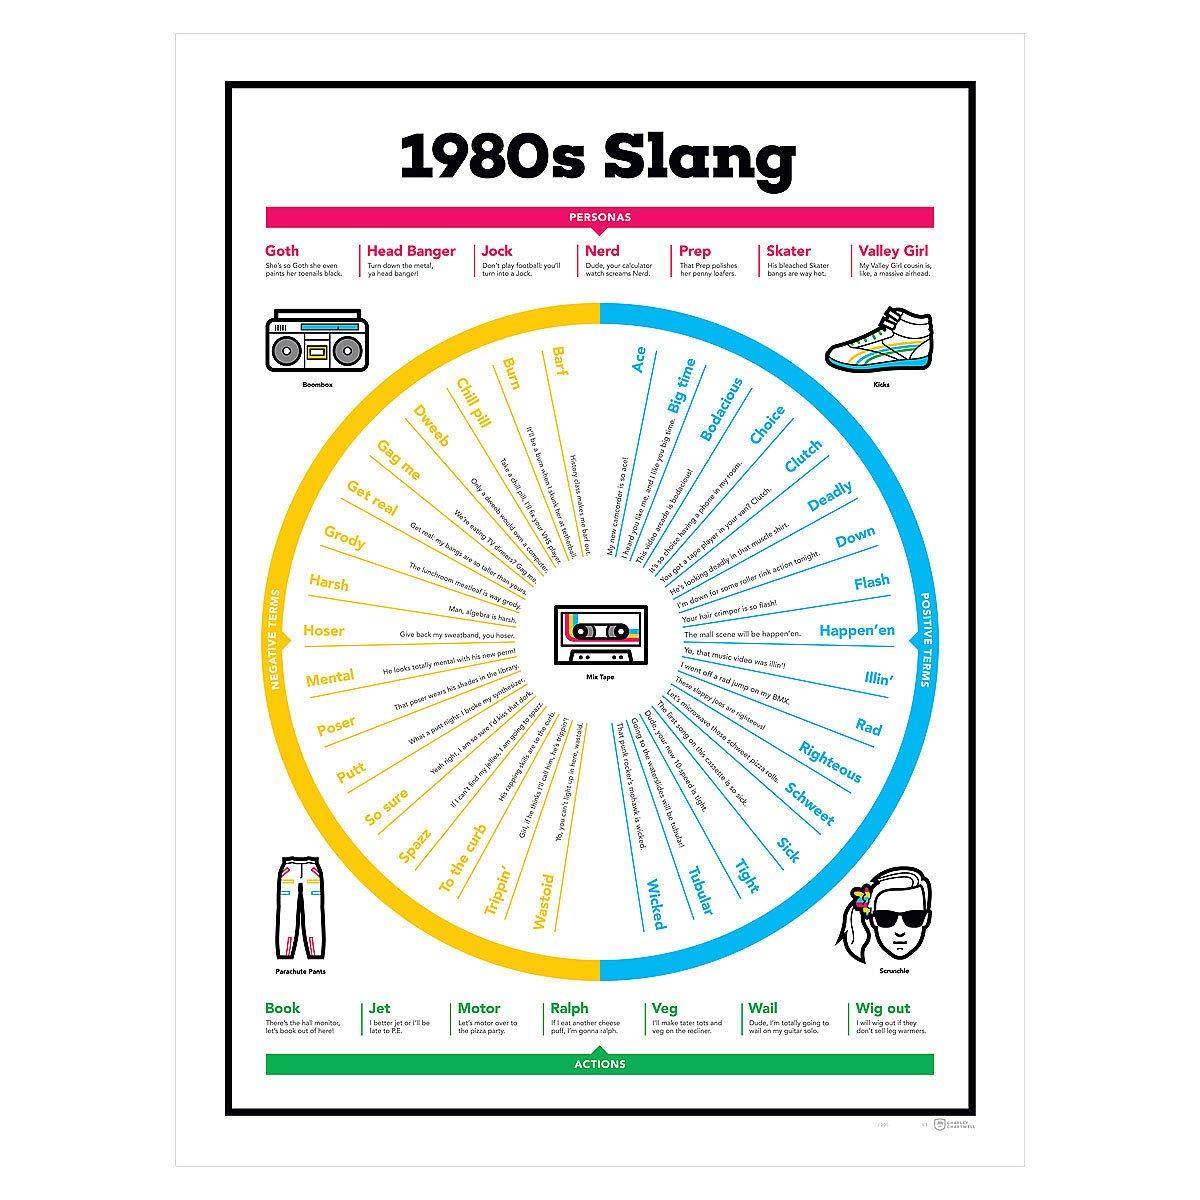 1980s Slang Chart | 80s terms | UncommonGoods